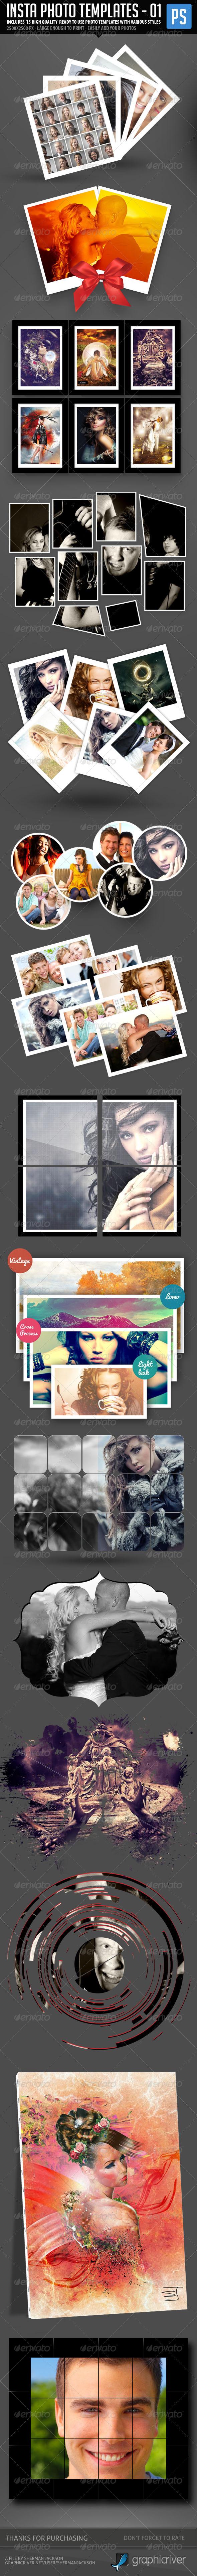 Insta Photo Templates (15 in 1) - Photo Templates Graphics